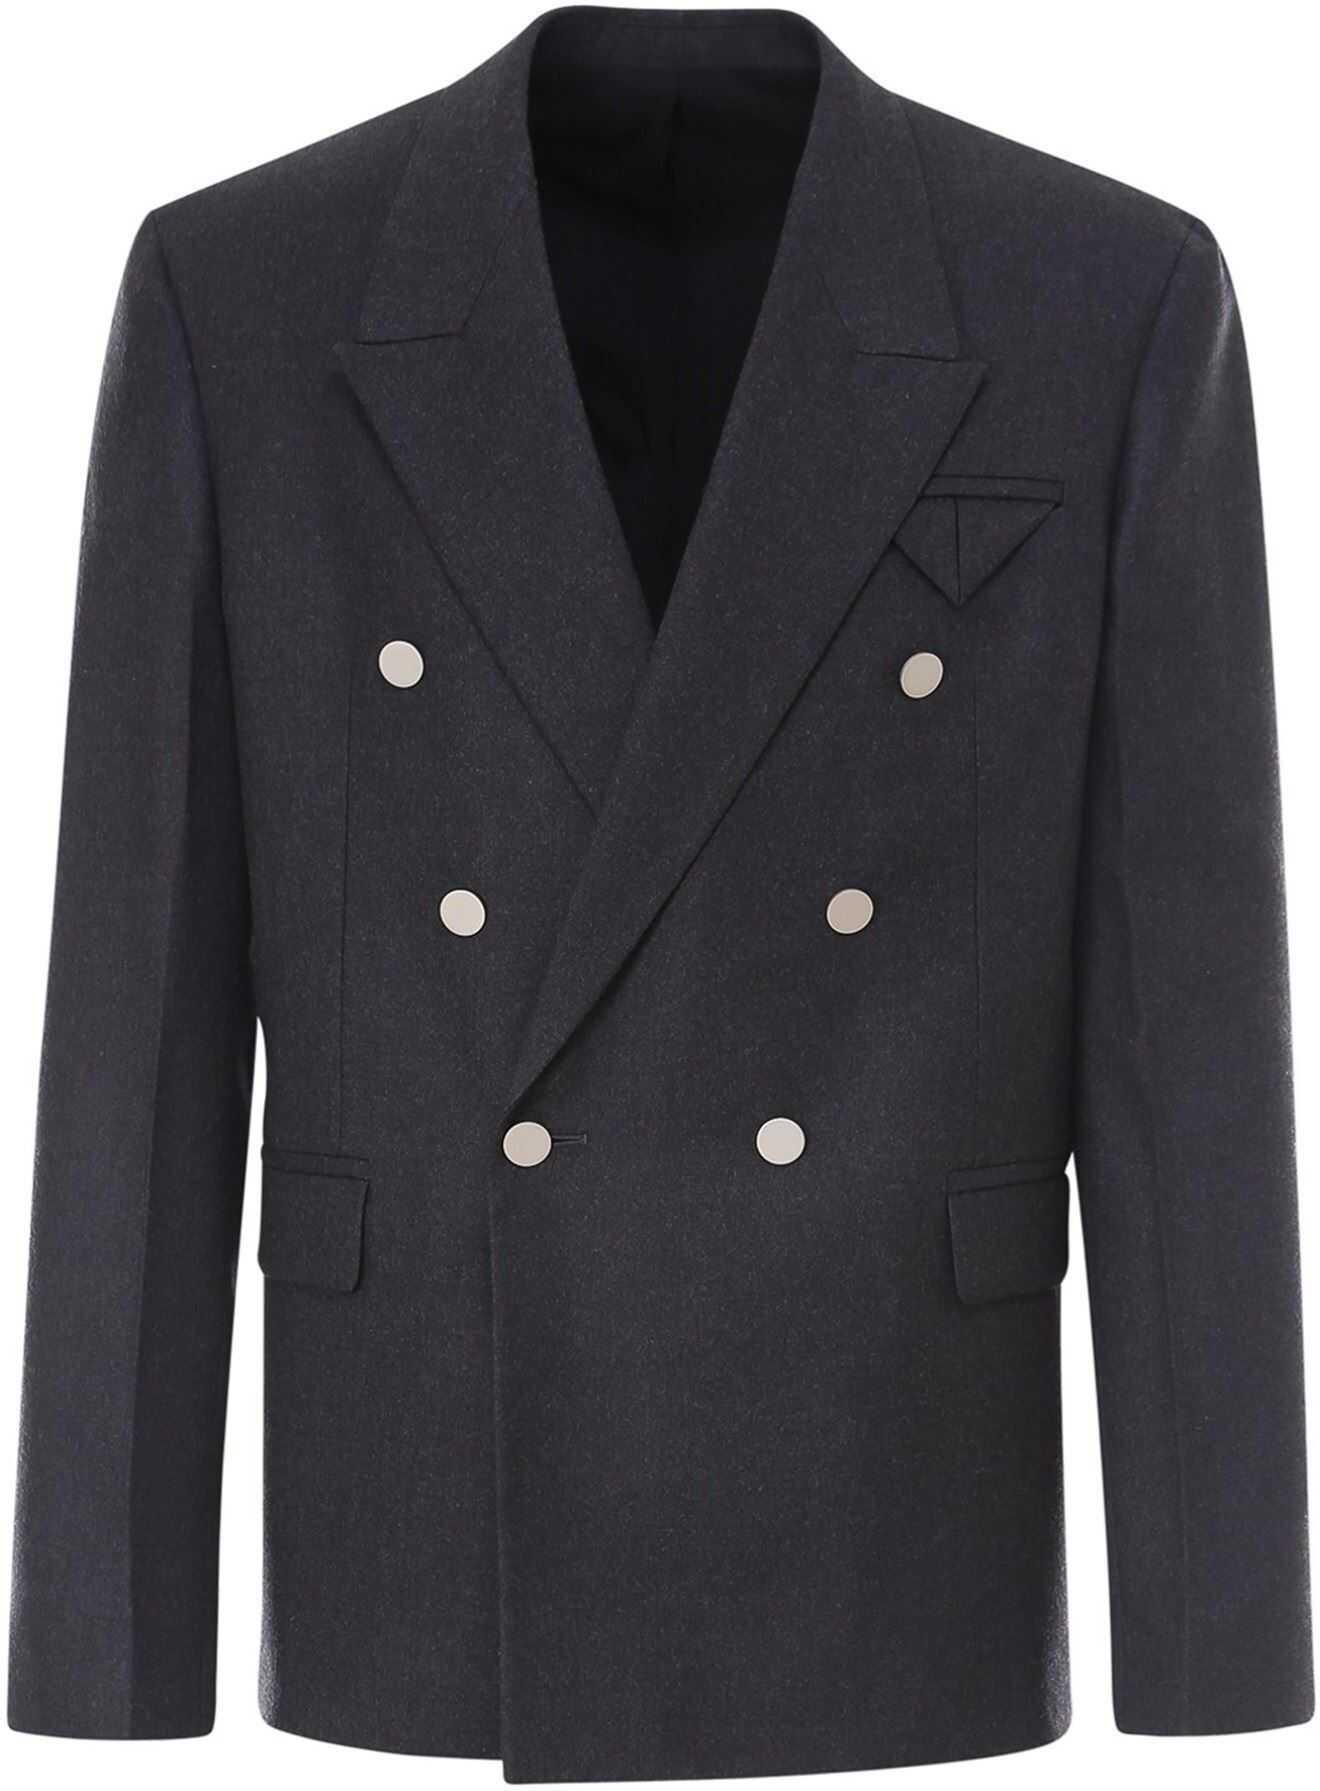 Bottega Veneta Wool Blazer In Grey Grey imagine